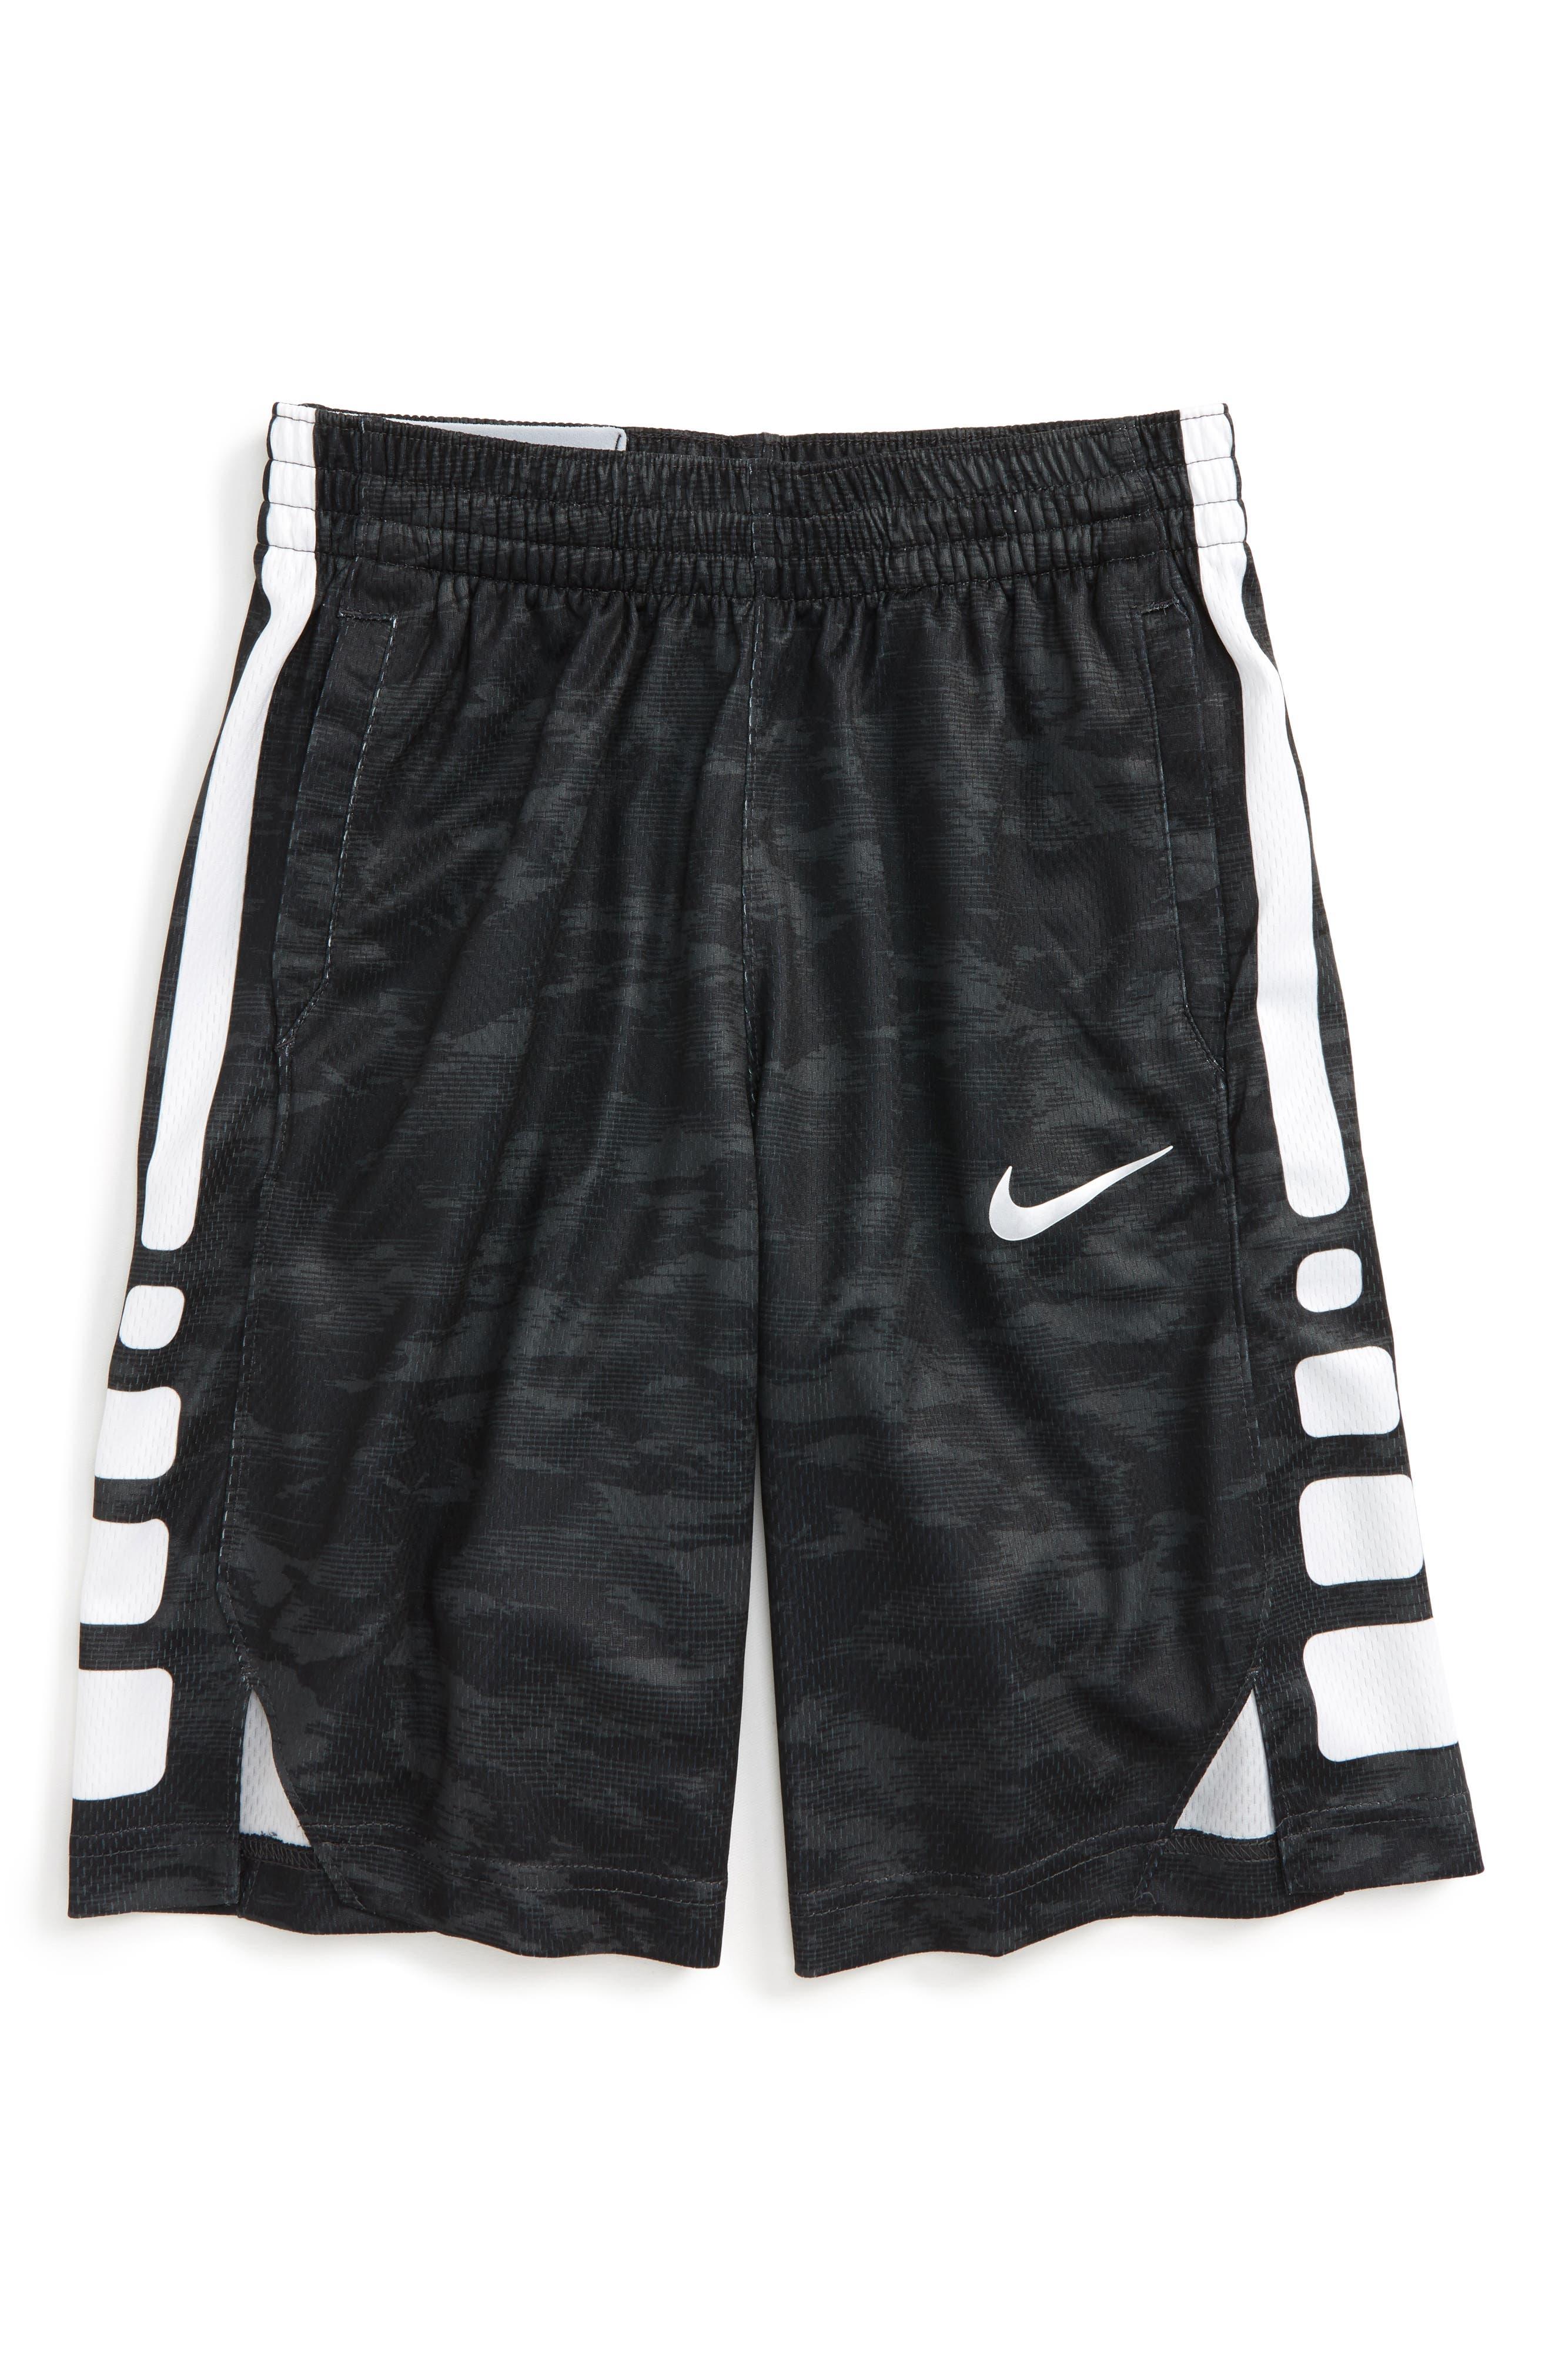 Dry Elite Basketball Shorts,                             Main thumbnail 1, color,                             010